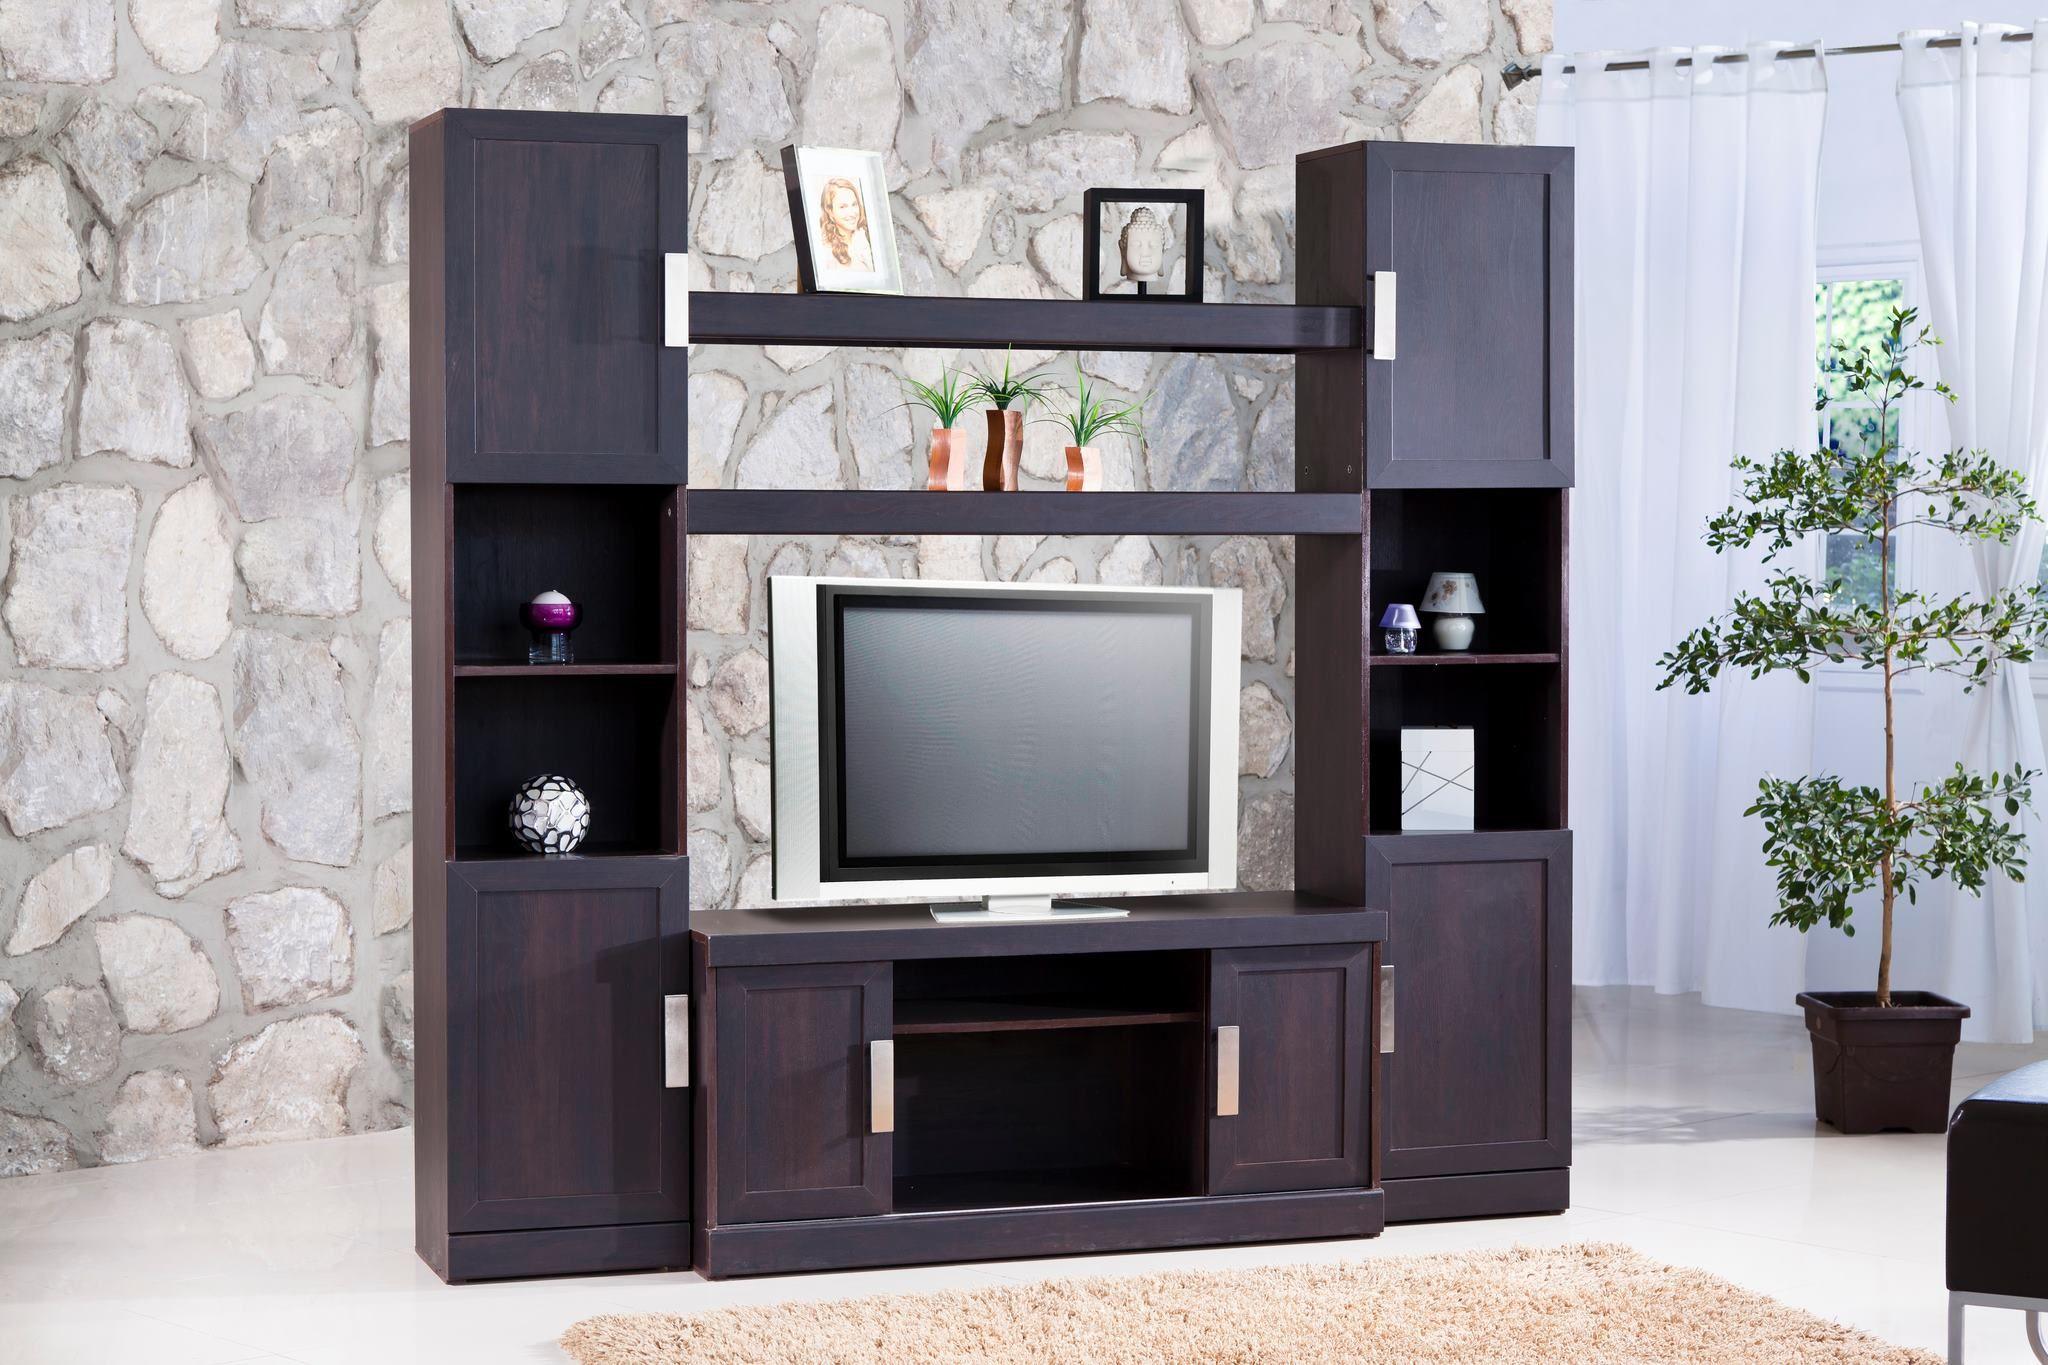 Muebles Yroncoso - Stand De Tv Troncoso Muebles Home Pinterest Tv Y Decoraci N[mjhdah]https://http2.mlstatic.com/litera-preciosa-muy-durable-madera-100-de-muebles-troncoso-D_NQ_NP_755176-MLM25687439194_062017-F.jpg